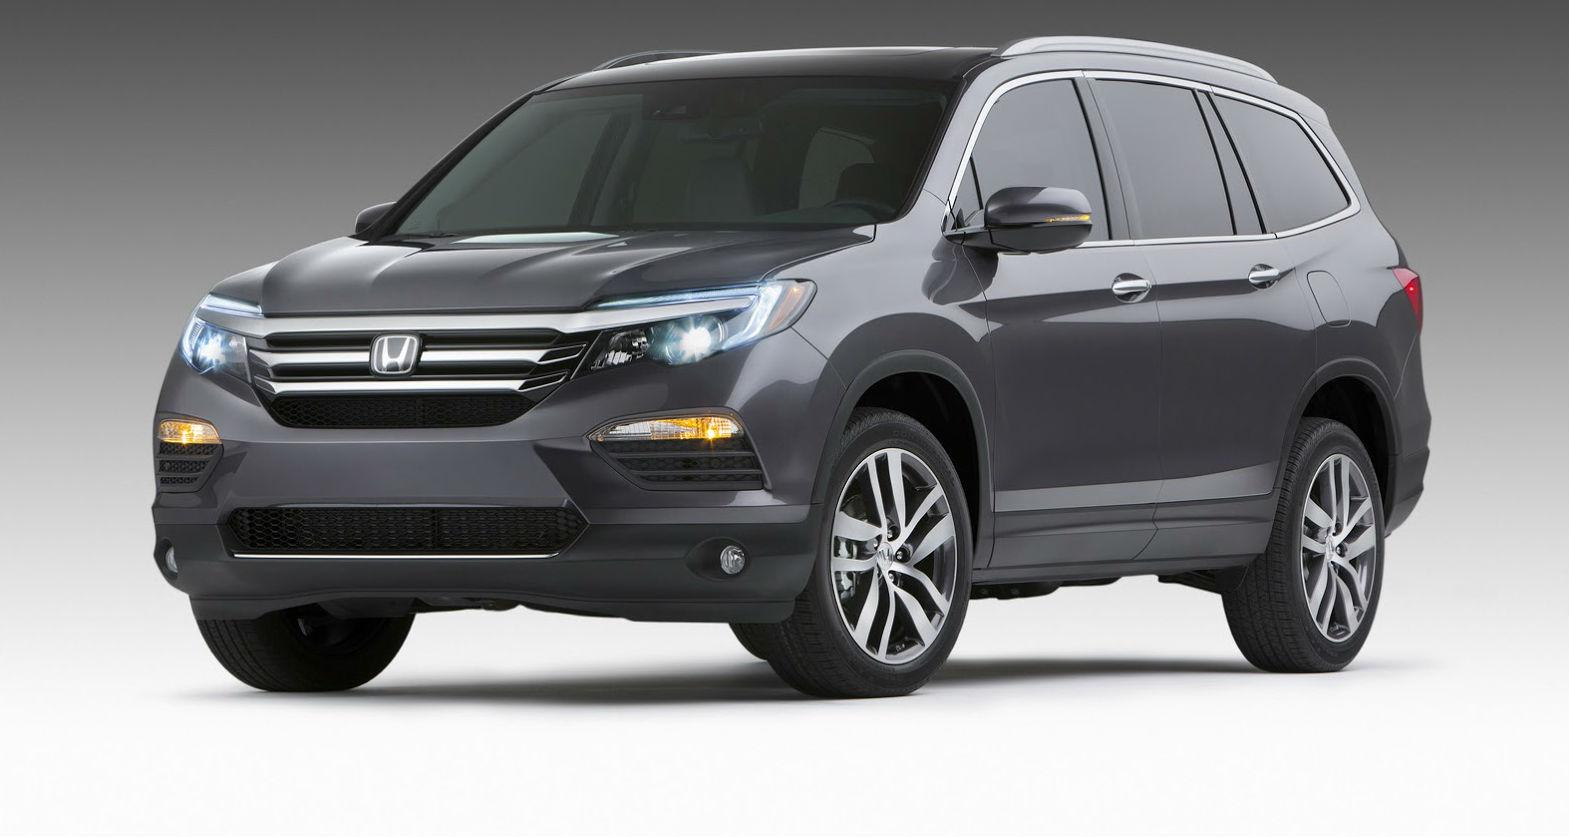 Honda Details New Pilot SUV